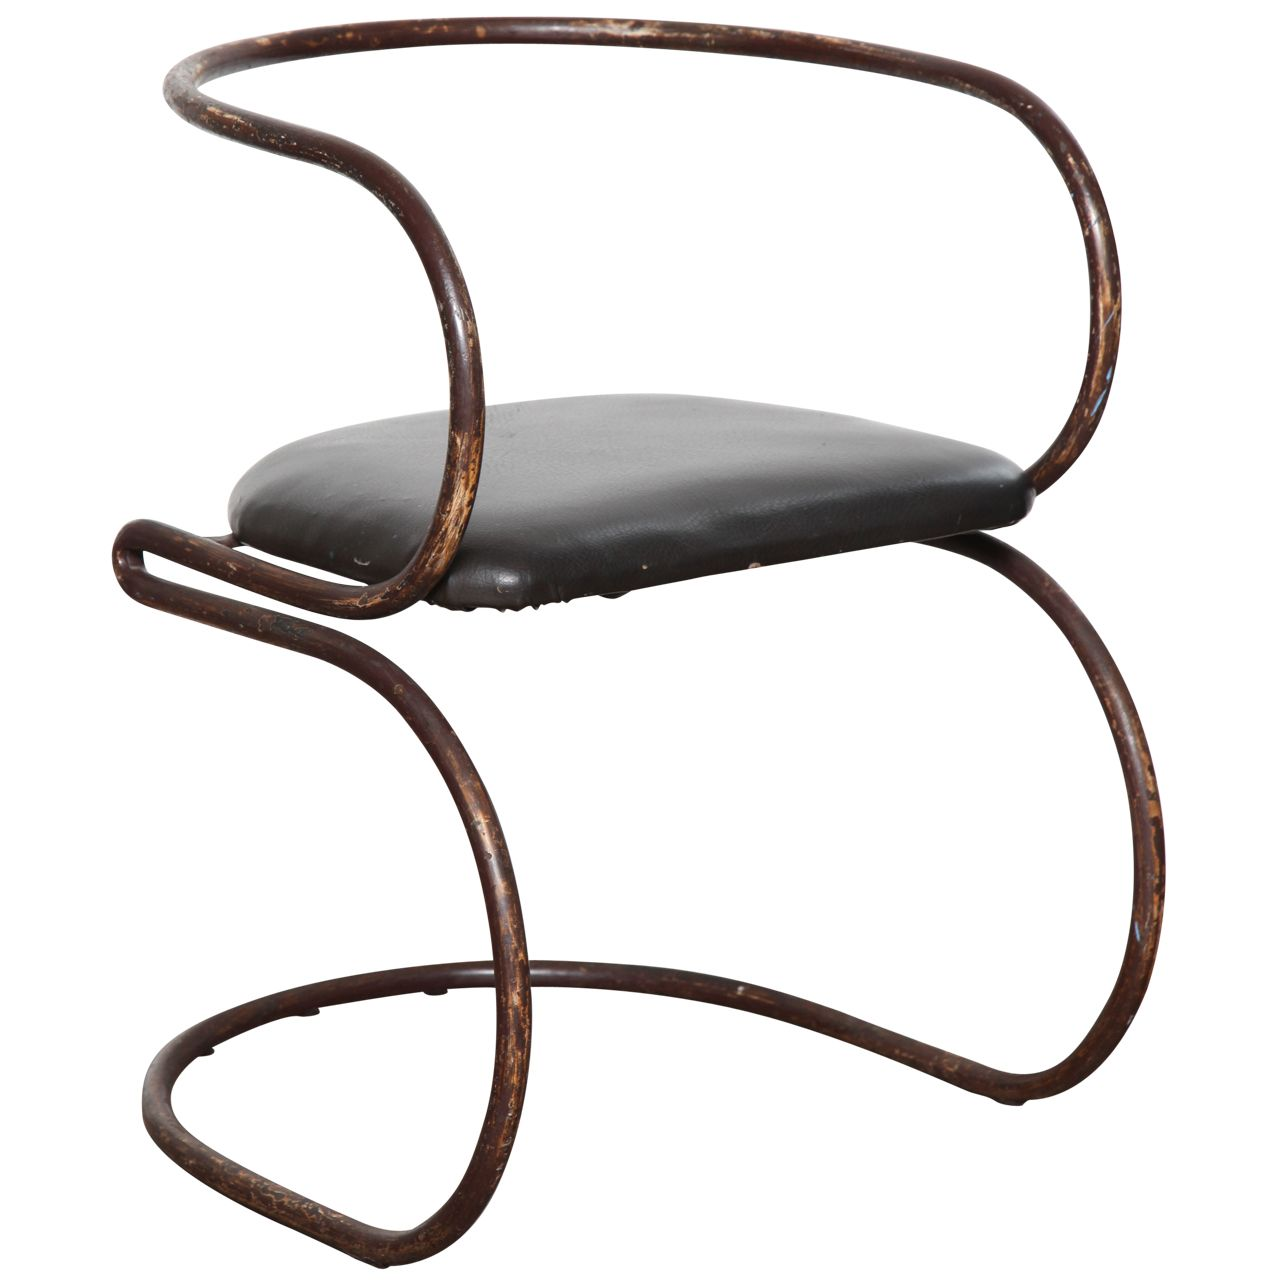 Bauhaus tubular steel lounge chair at 1stdibs - Nathan Horwitt Chair